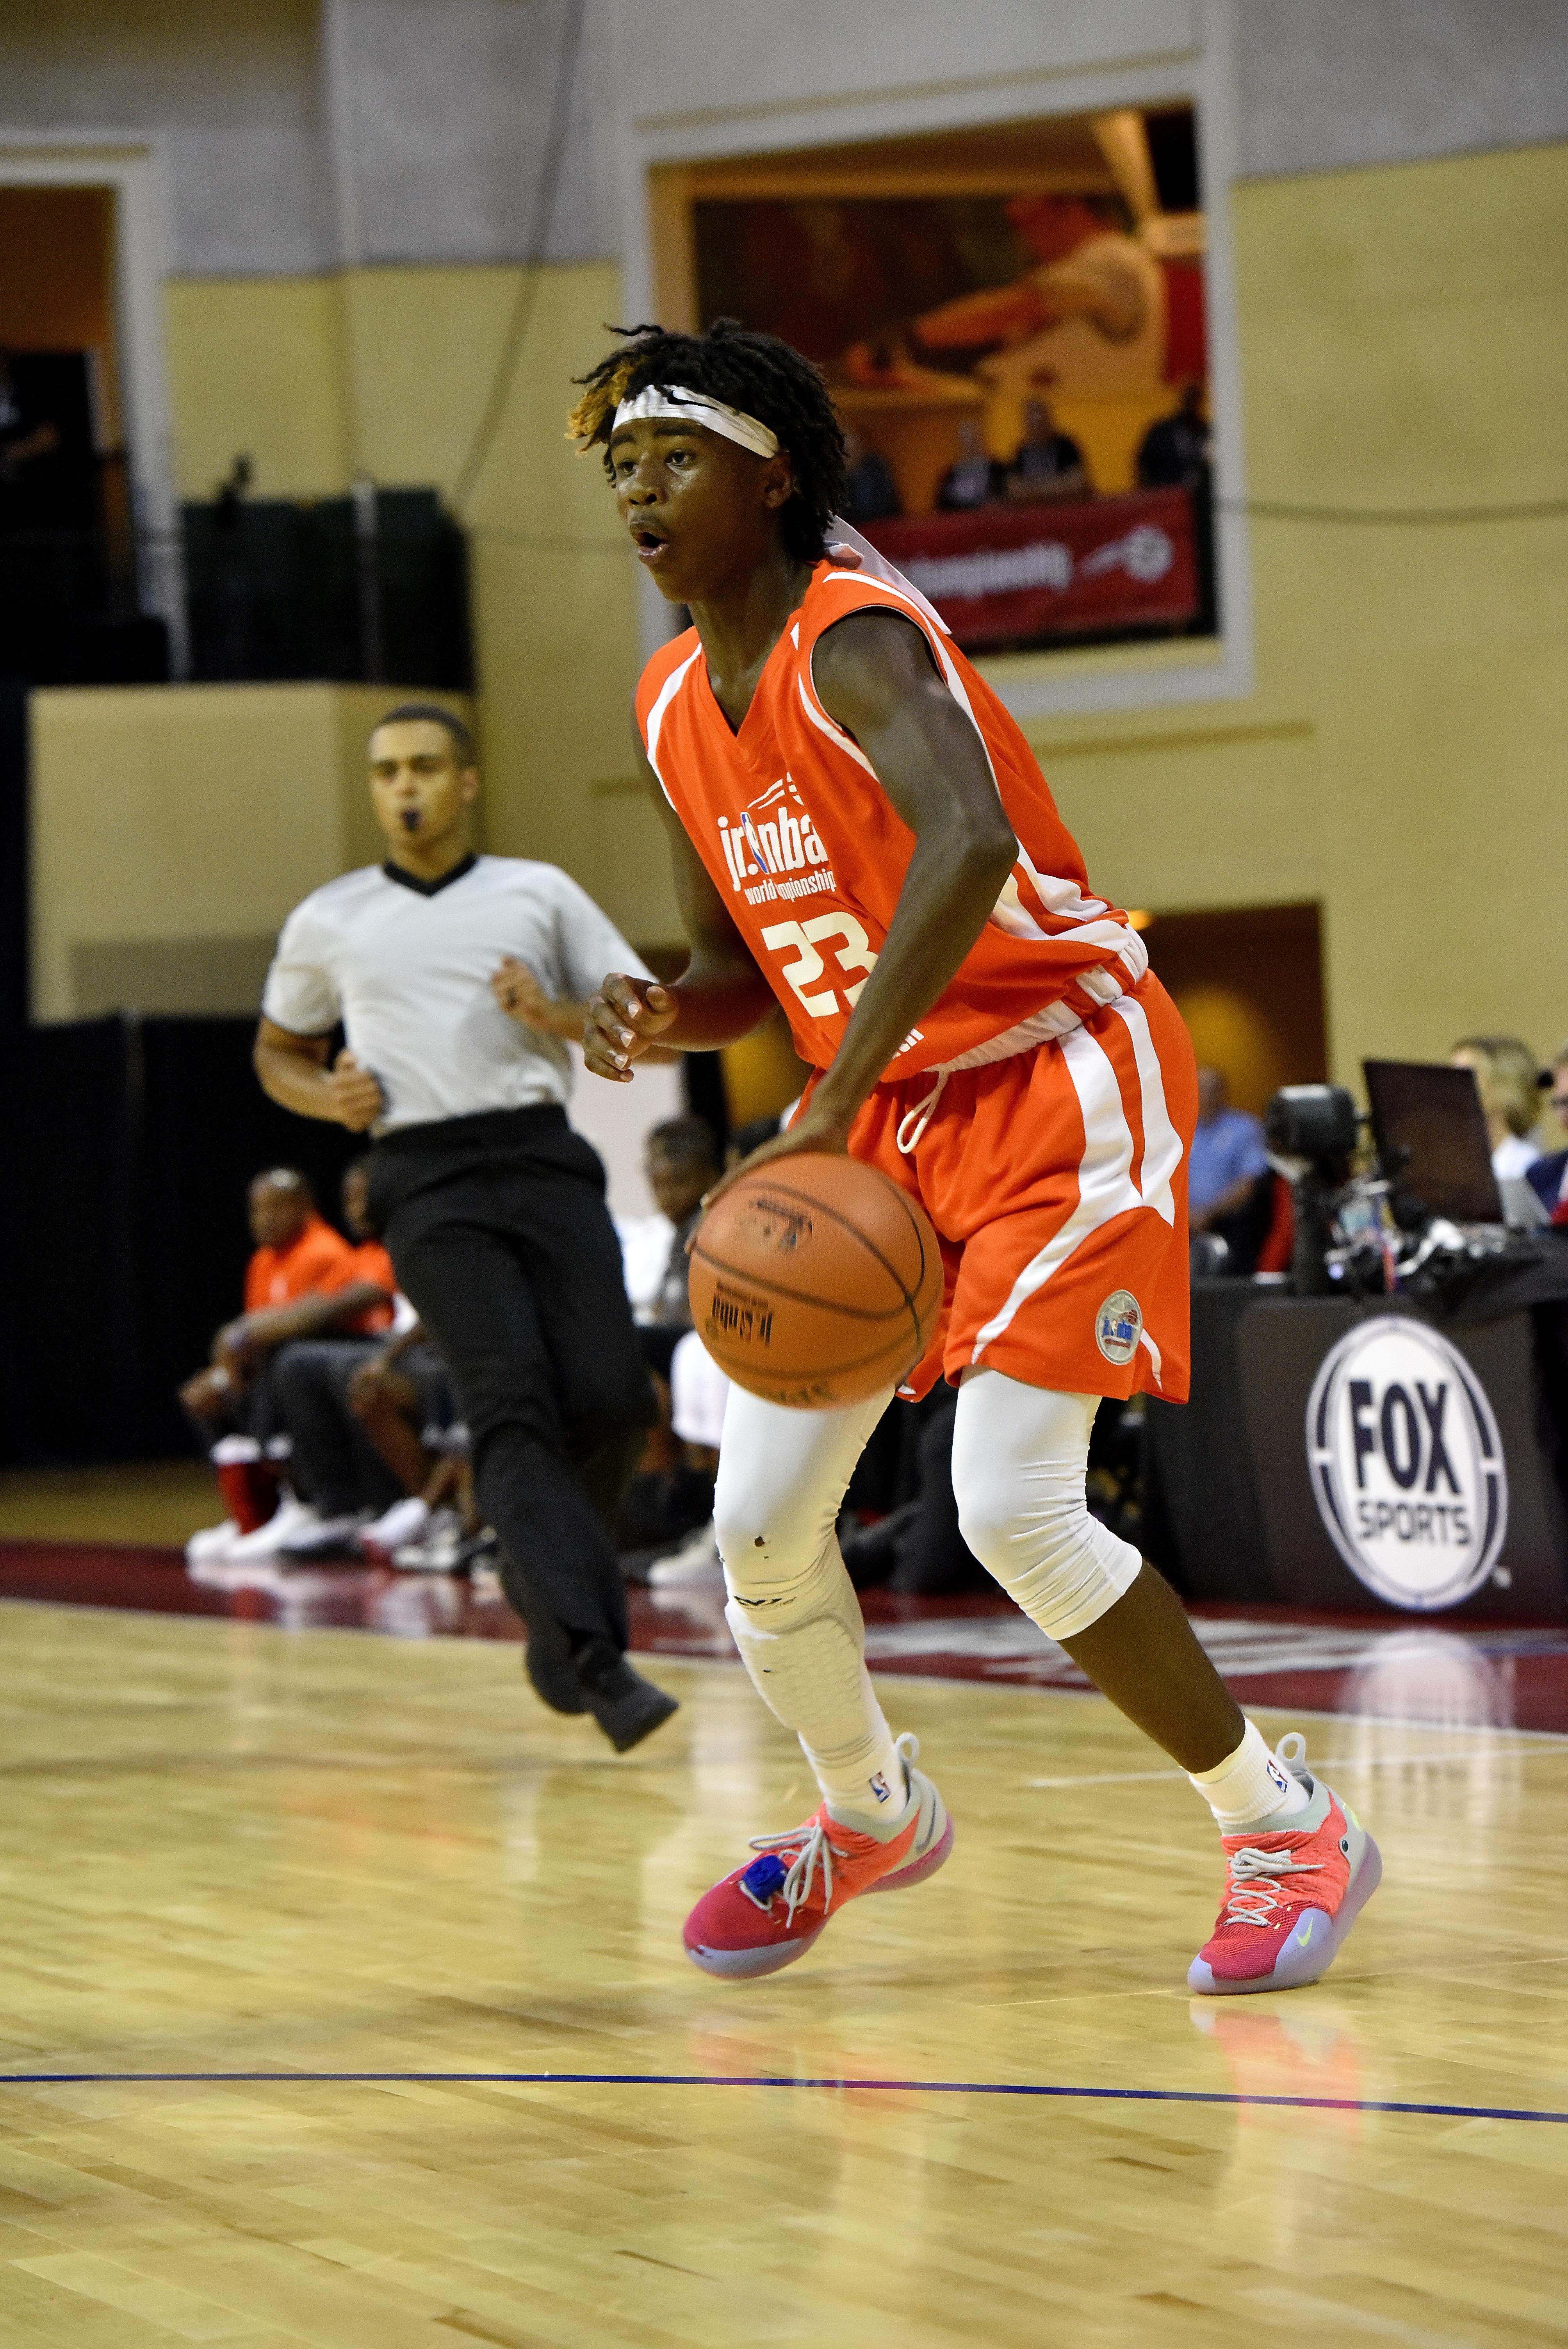 Jr. NBA World Championships U.S. Semifinals - Central Boys v South Boys